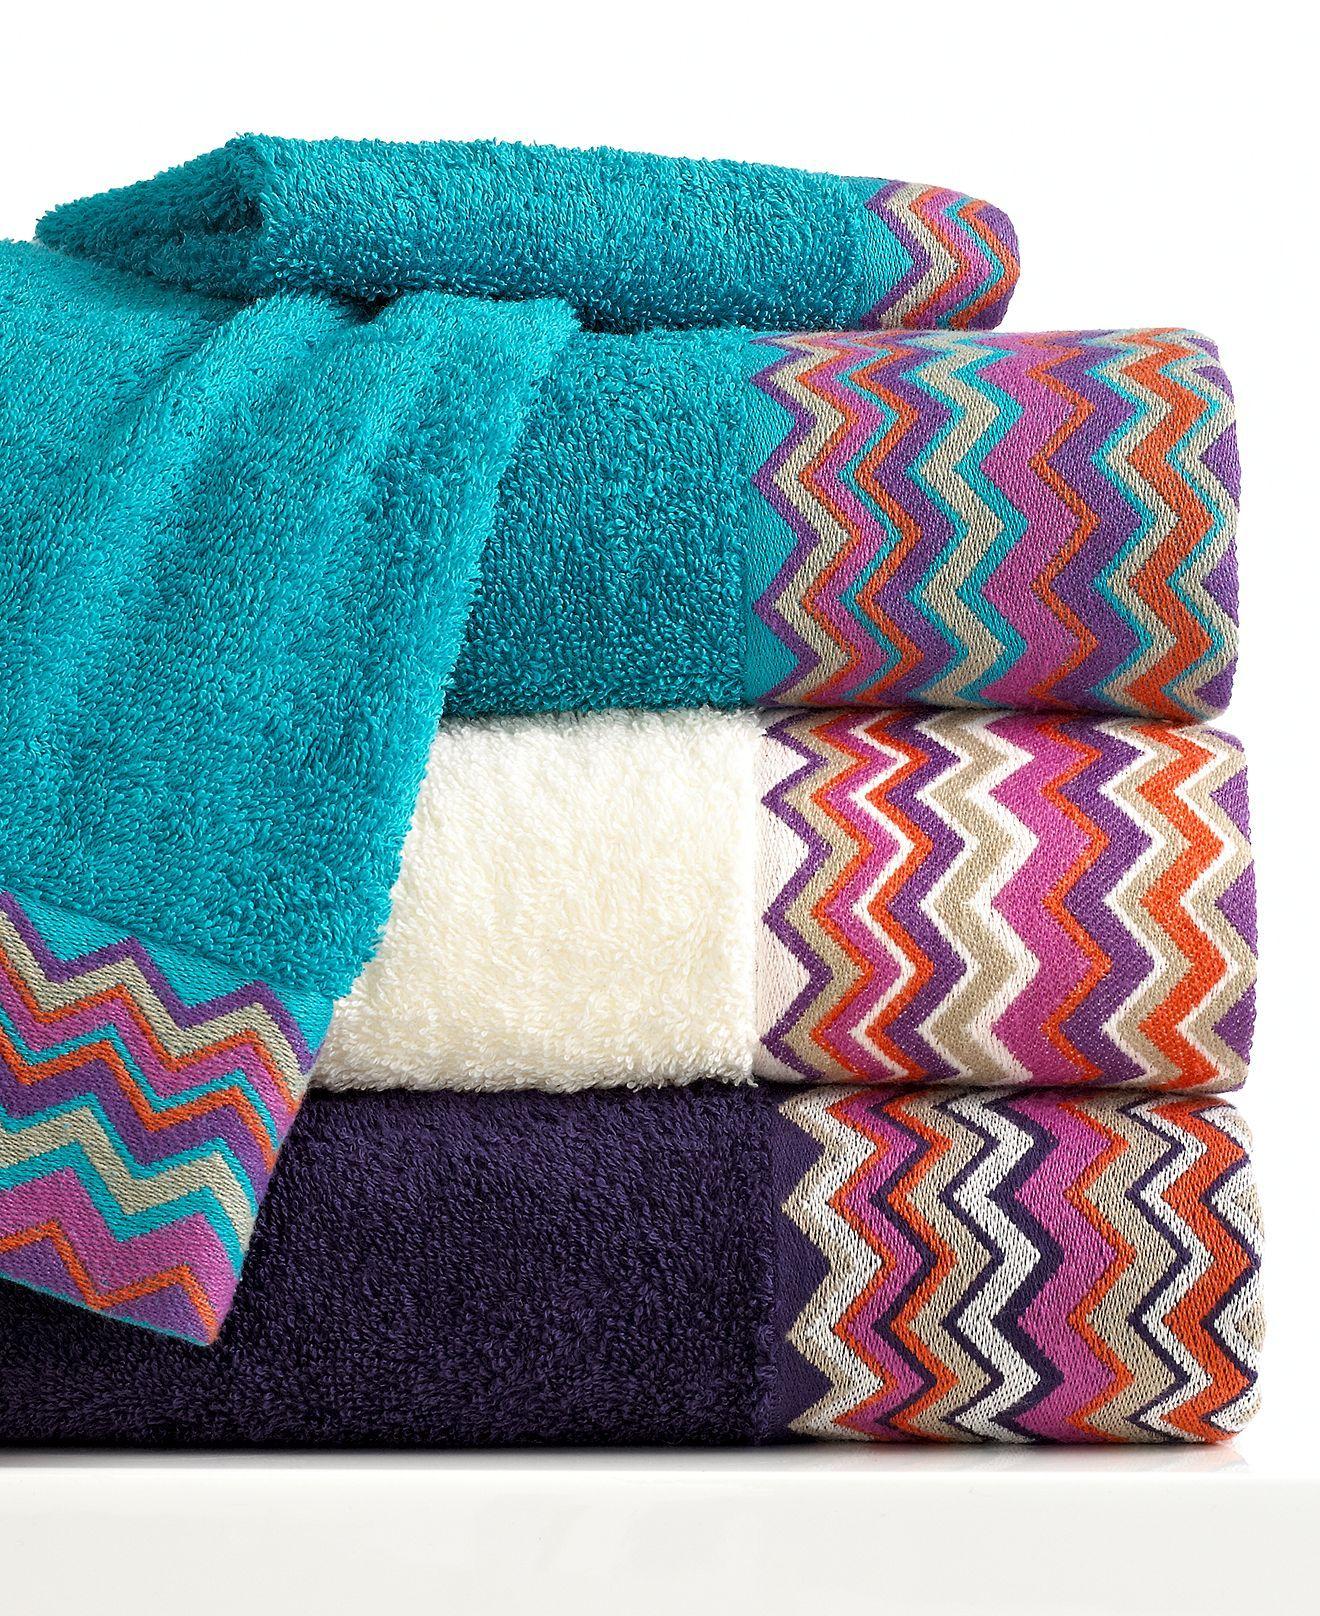 I Need New Washcloths Bianca Bath Towels Rainbow Chevron Collection Bath Towels Bed Bath Macy S Dokuma Havlular Nakis